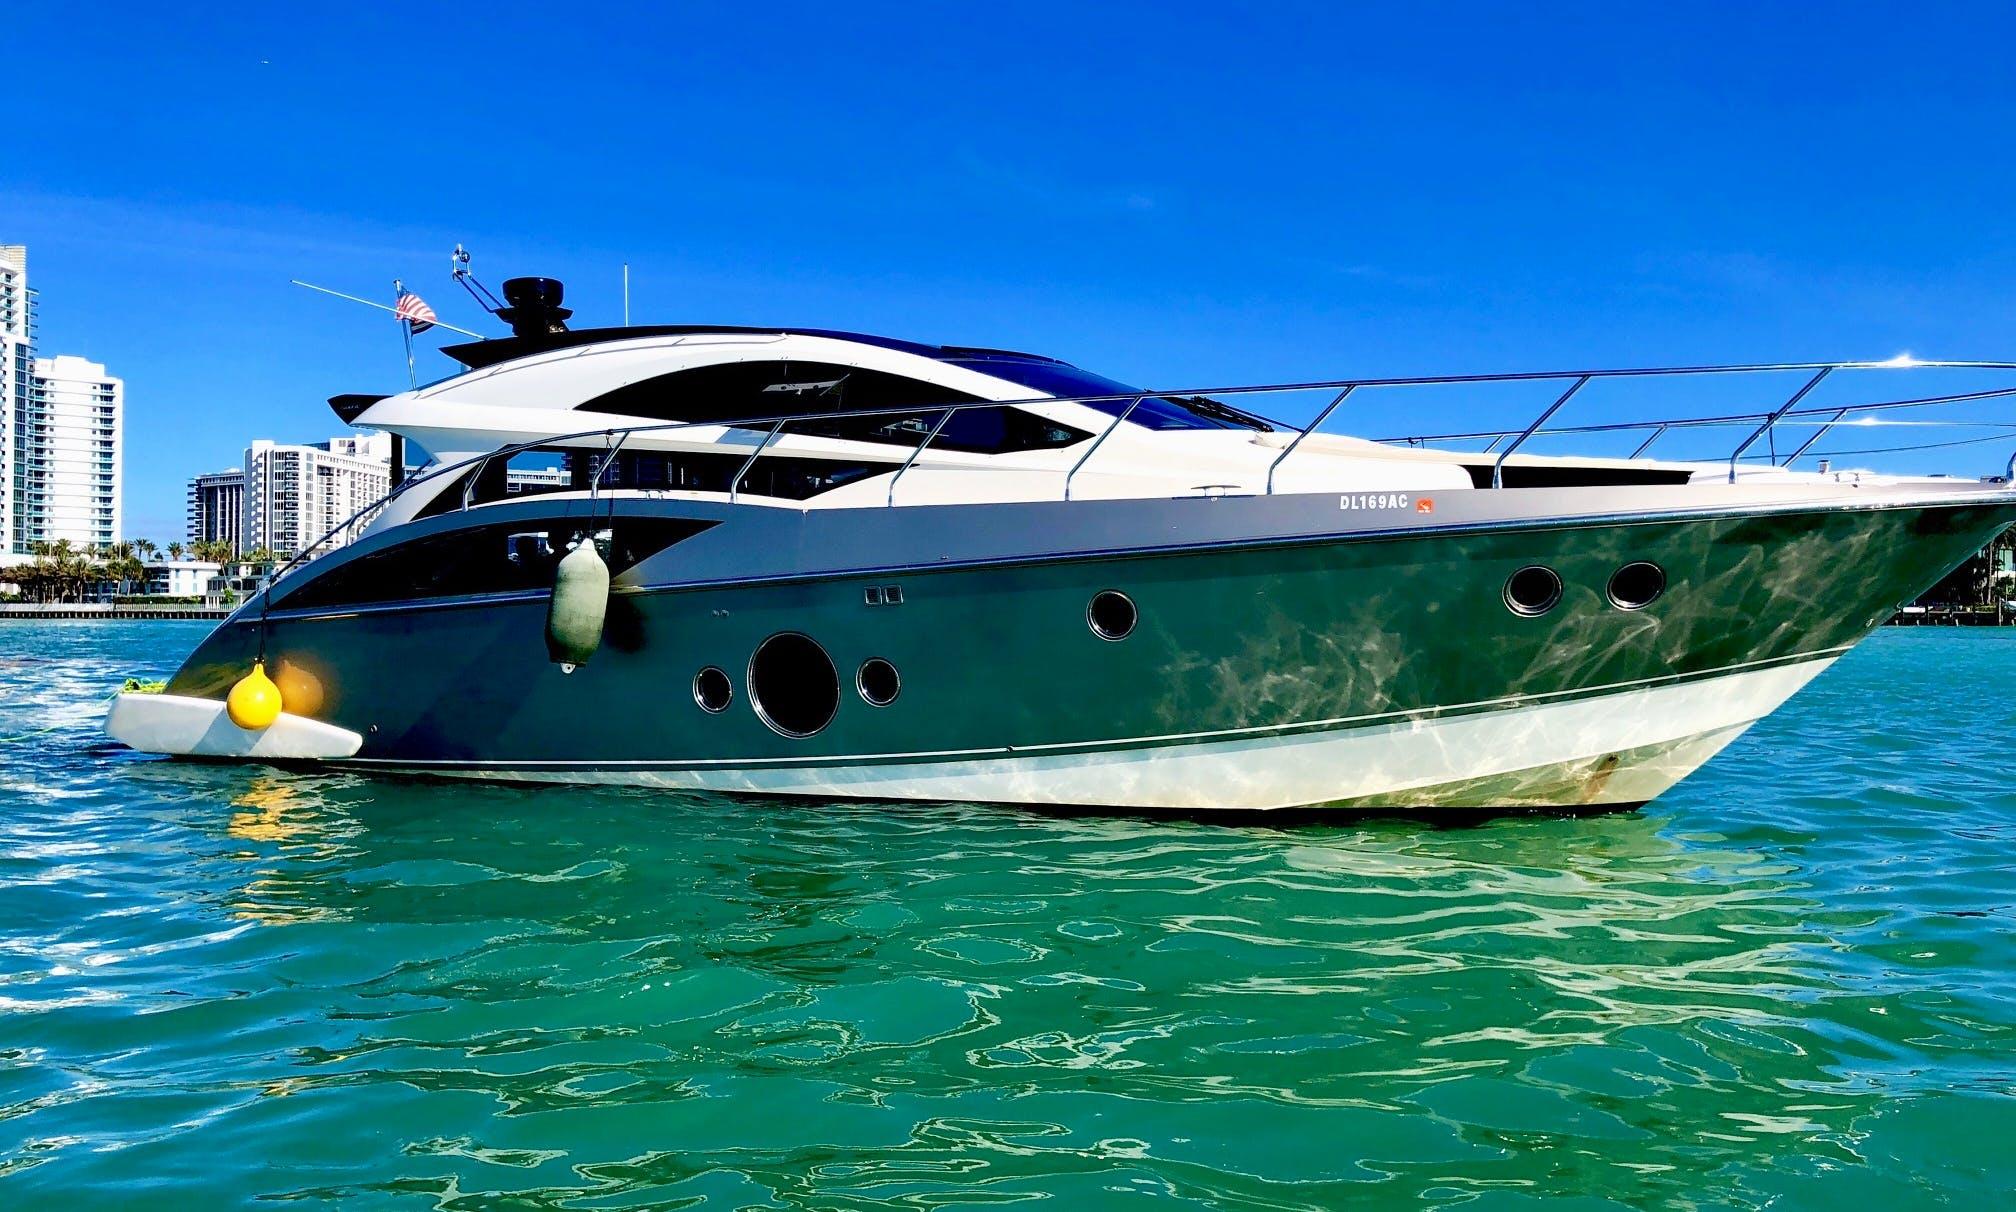 Marquise 500 SC luxurios 50' M/Y charter Miami Beach, Bahamas & Key West